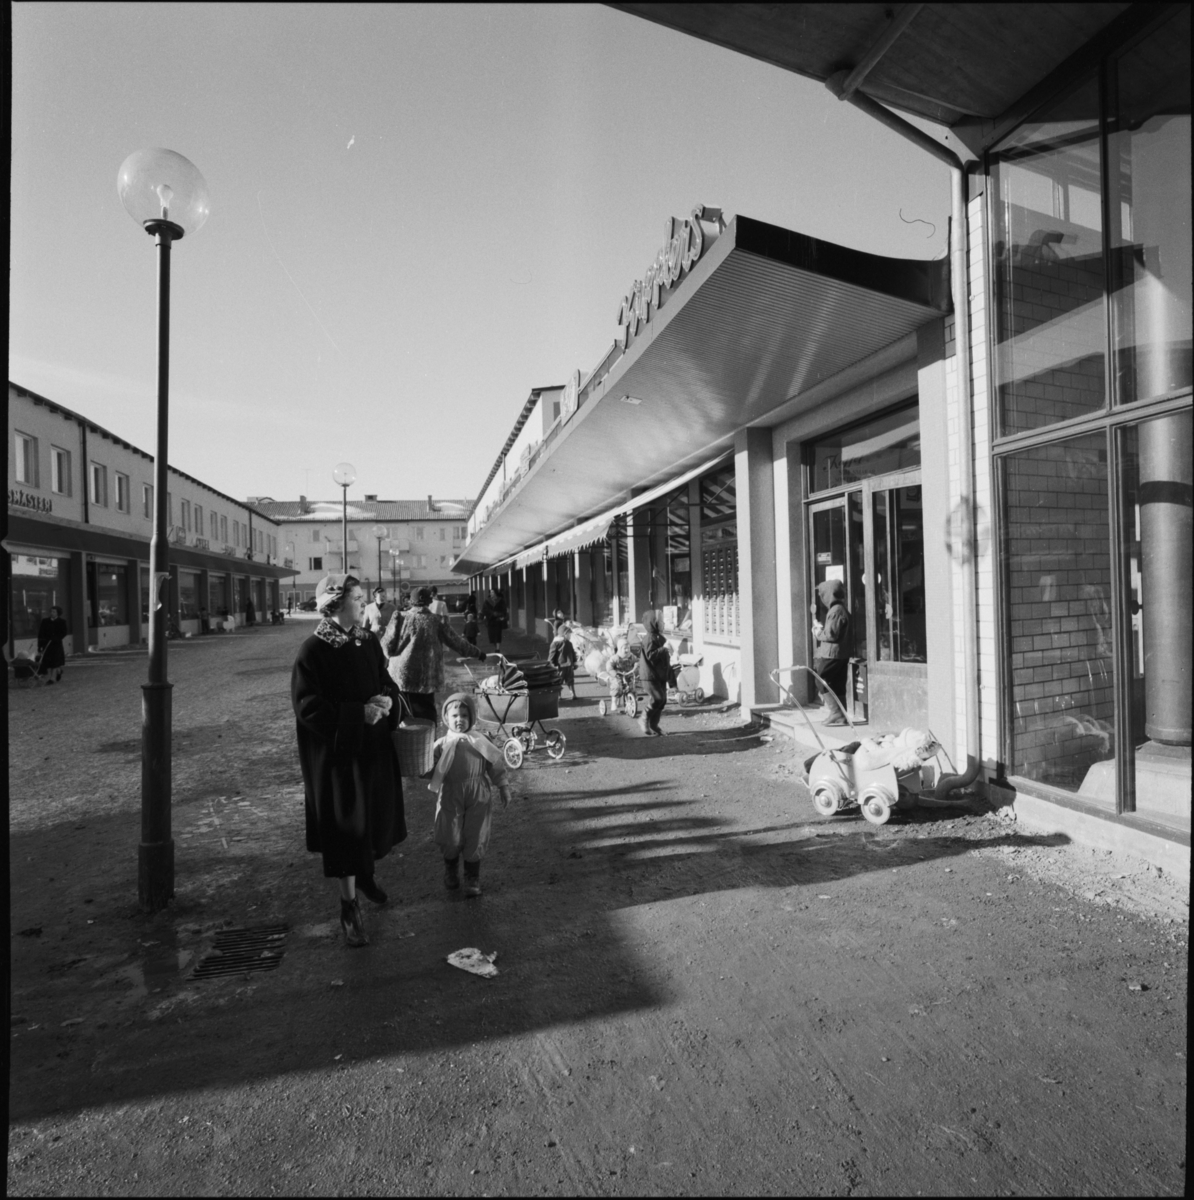 bandhagen centrum butiker